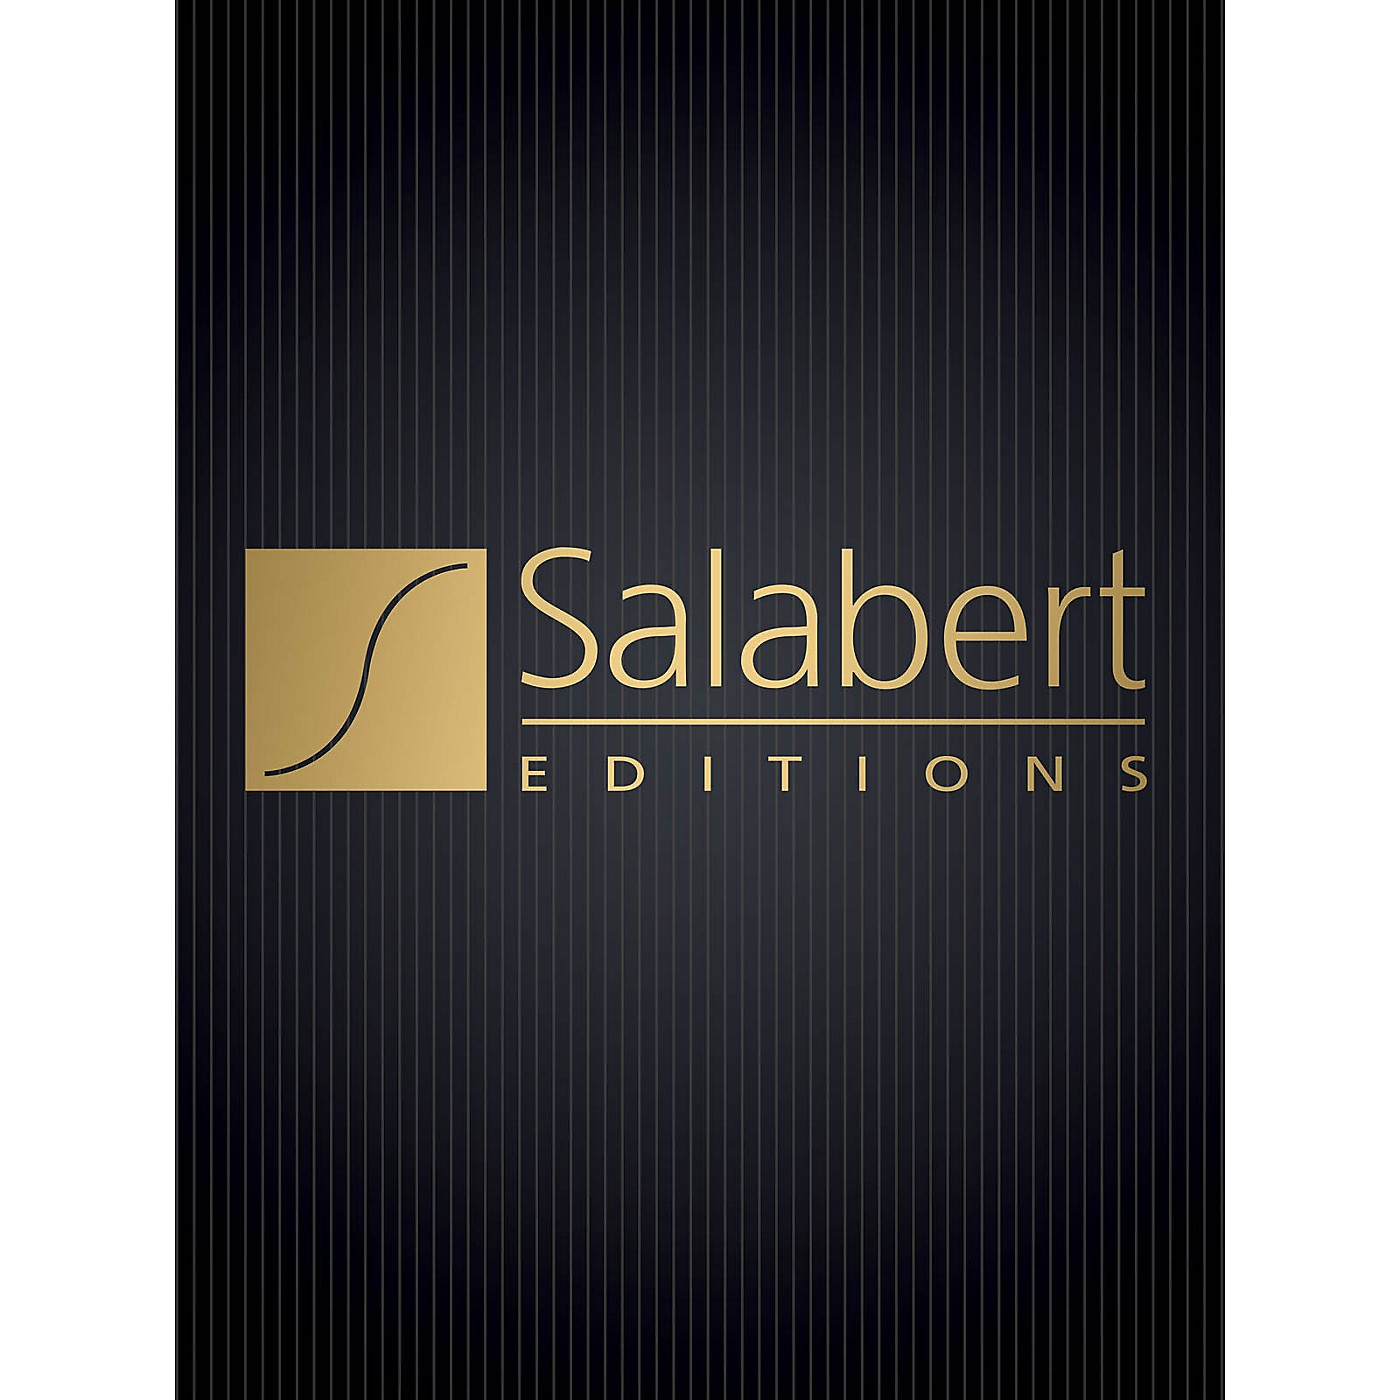 Editions Salabert Bénédiction de Dieu dans la solitude Piano Large Works Composed by Franz Liszt Edited by Alfred Cortot thumbnail